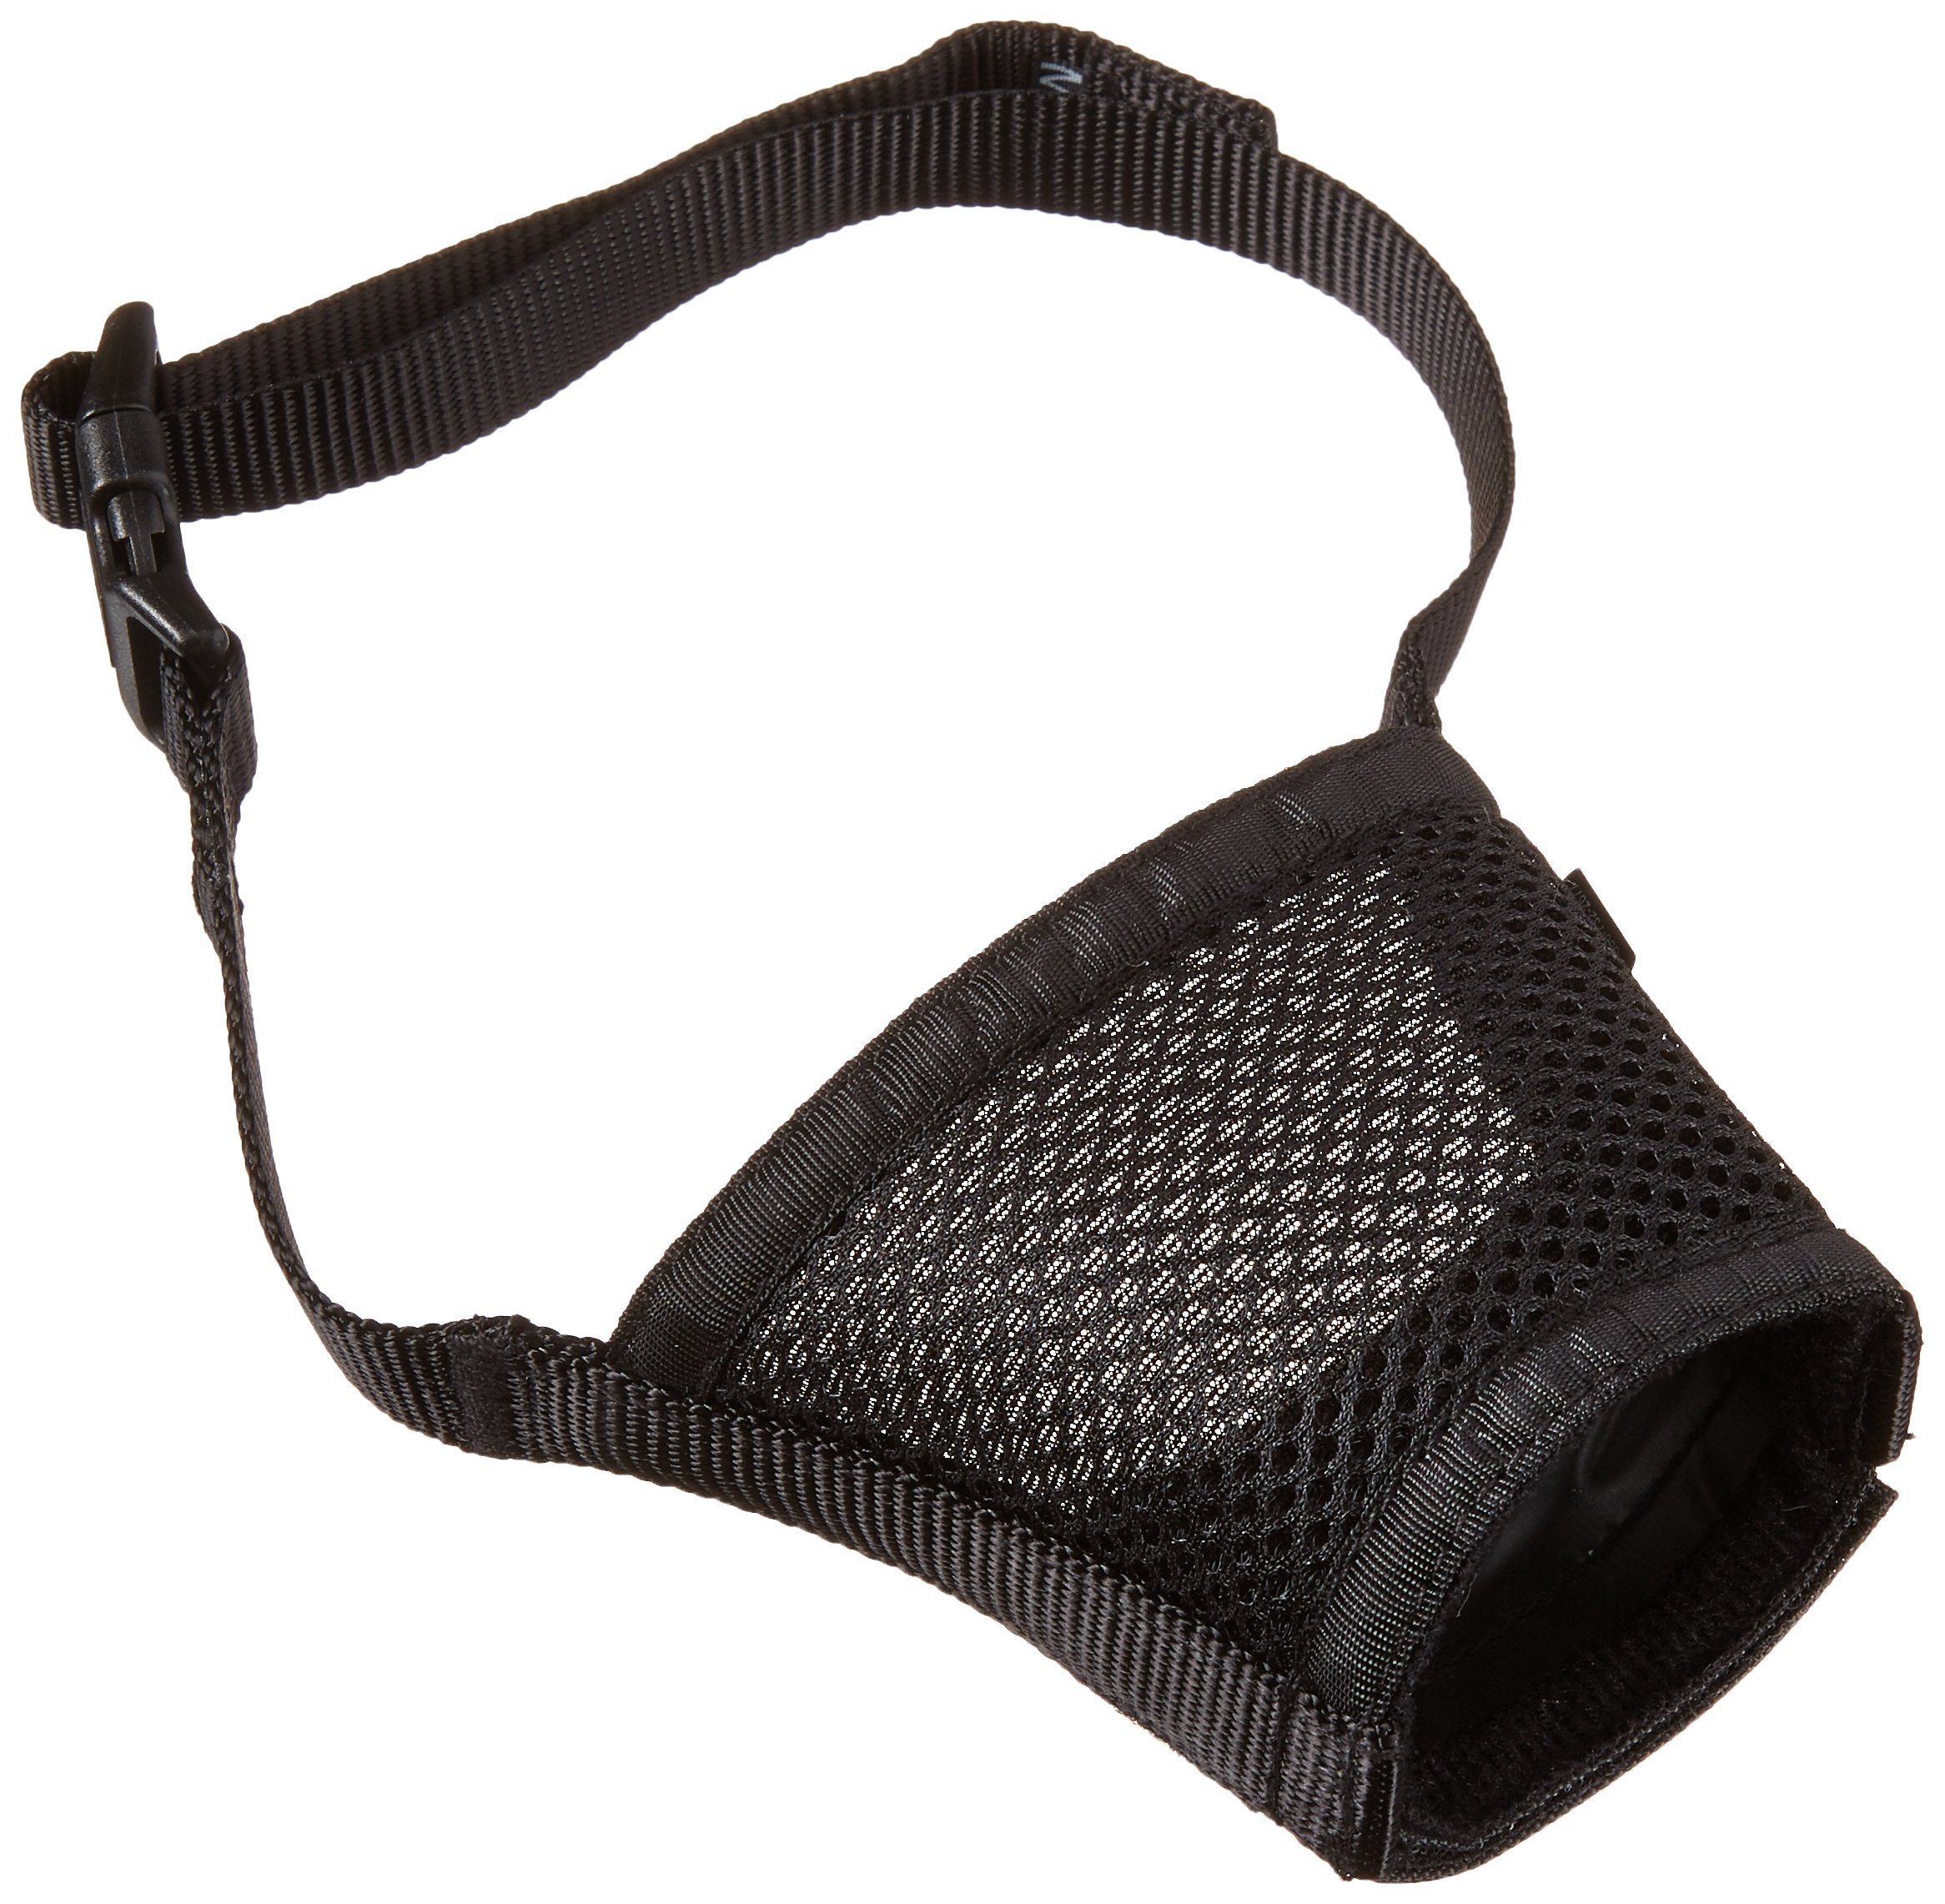 PetSafe Muzzle - Adjustable, Comfortable, Prevents Barking and Biting